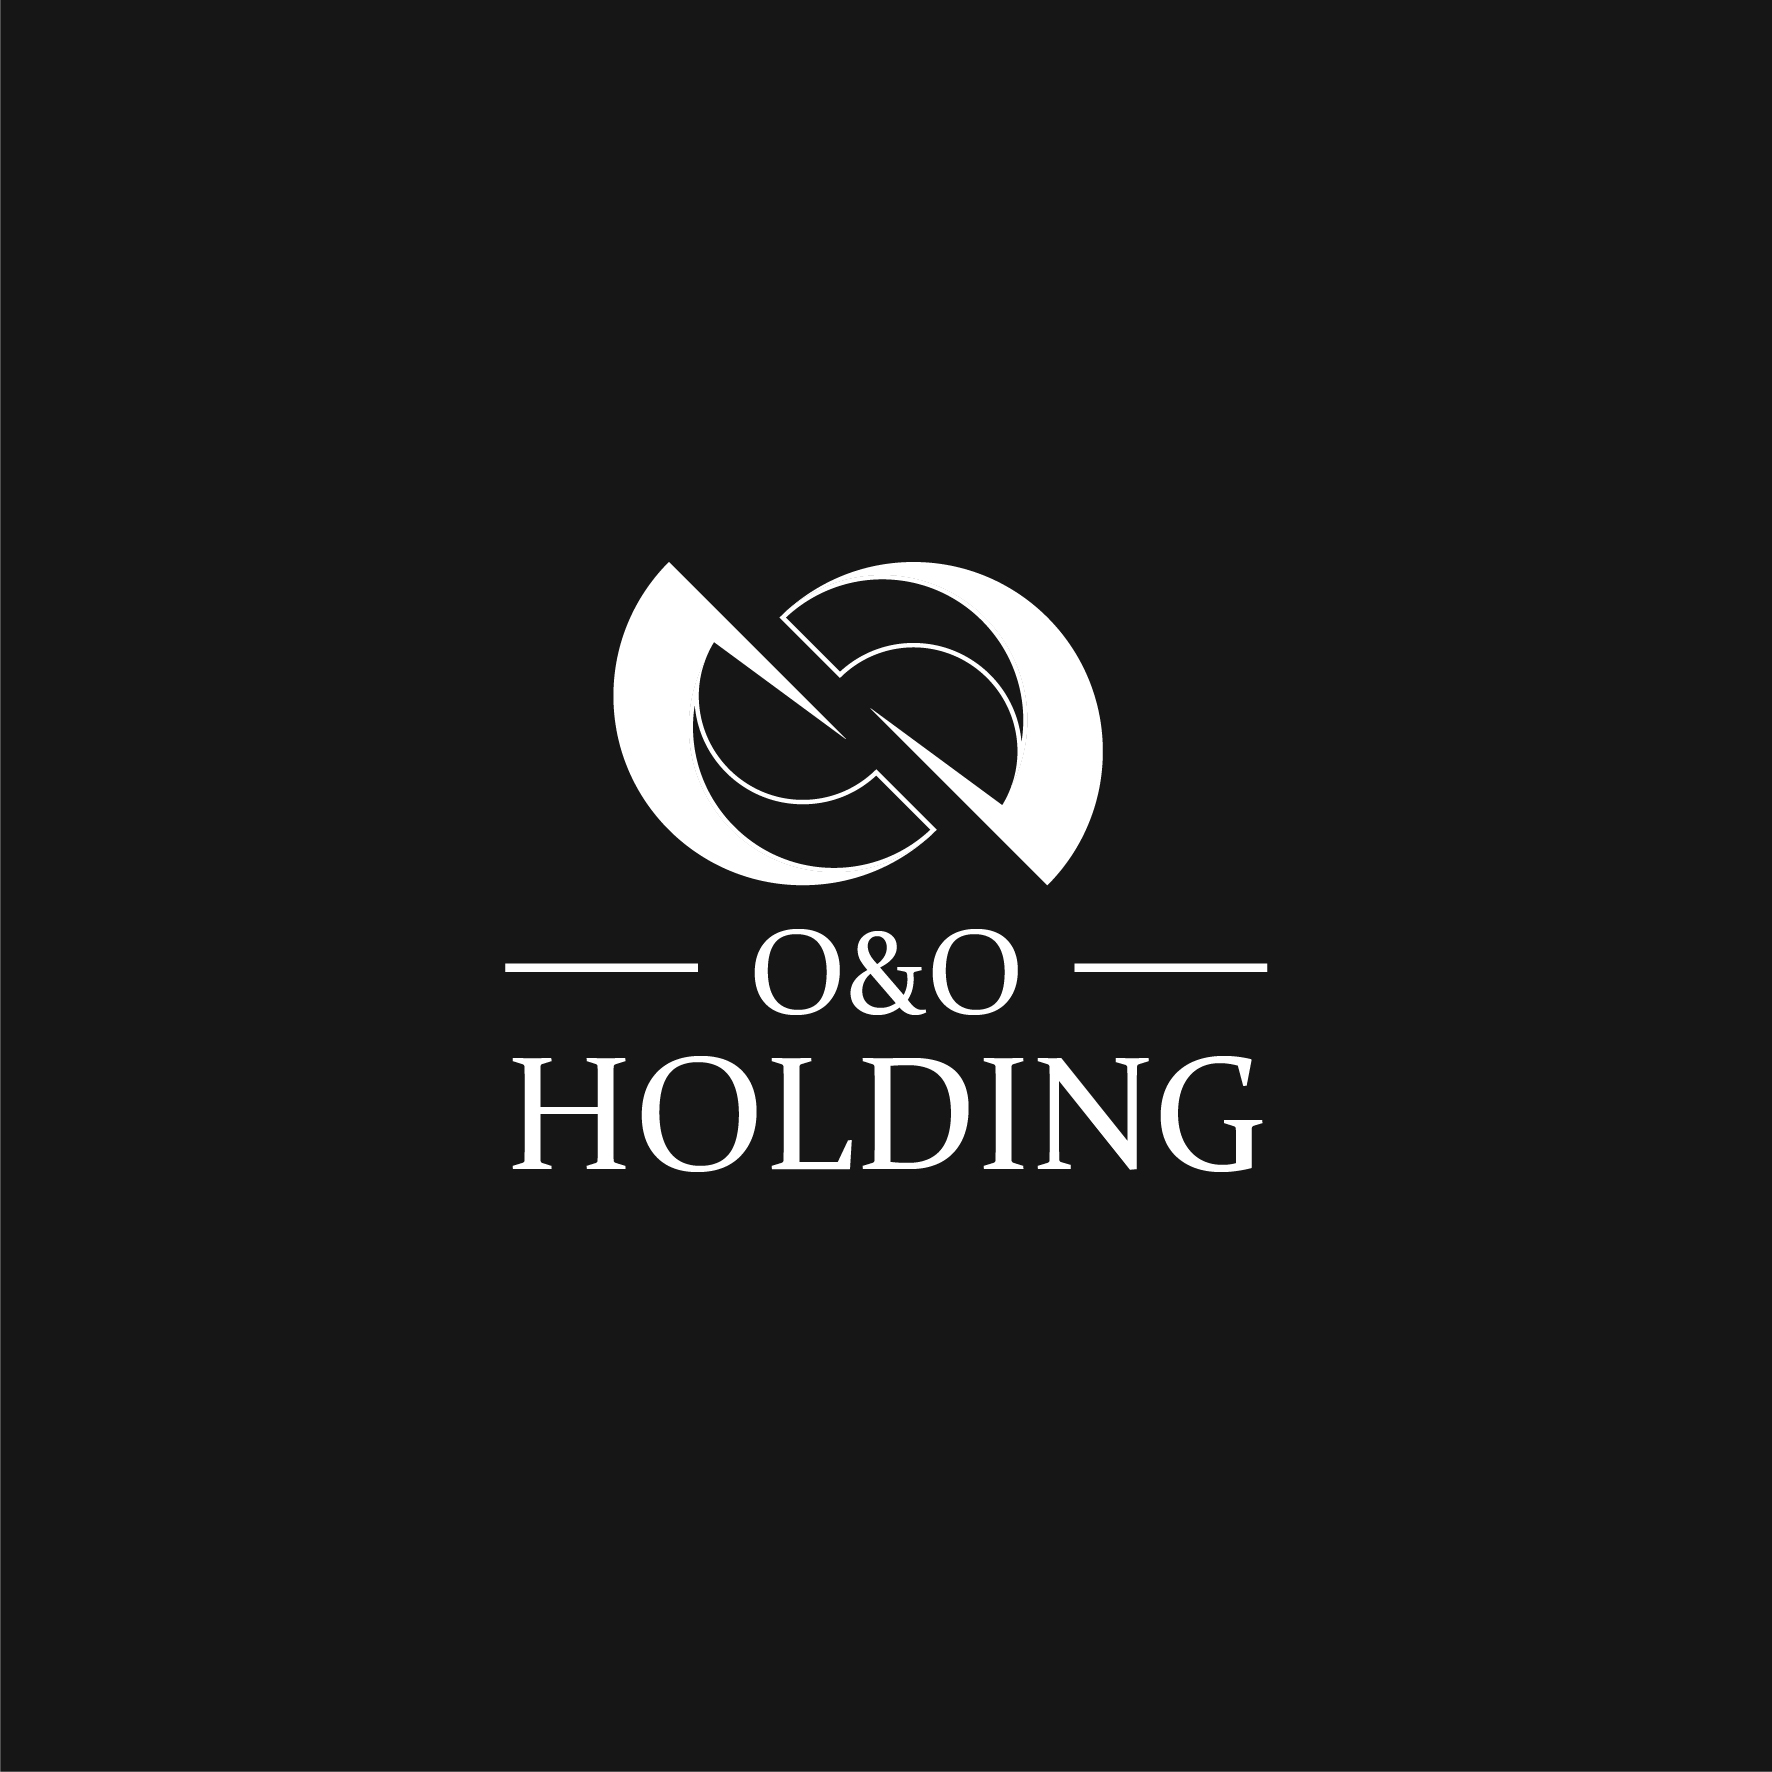 "Разработка Логотипа +  Фирменного знака для компании ""O & O HOLDING"" фото f_0065c7b044c52625.jpg"